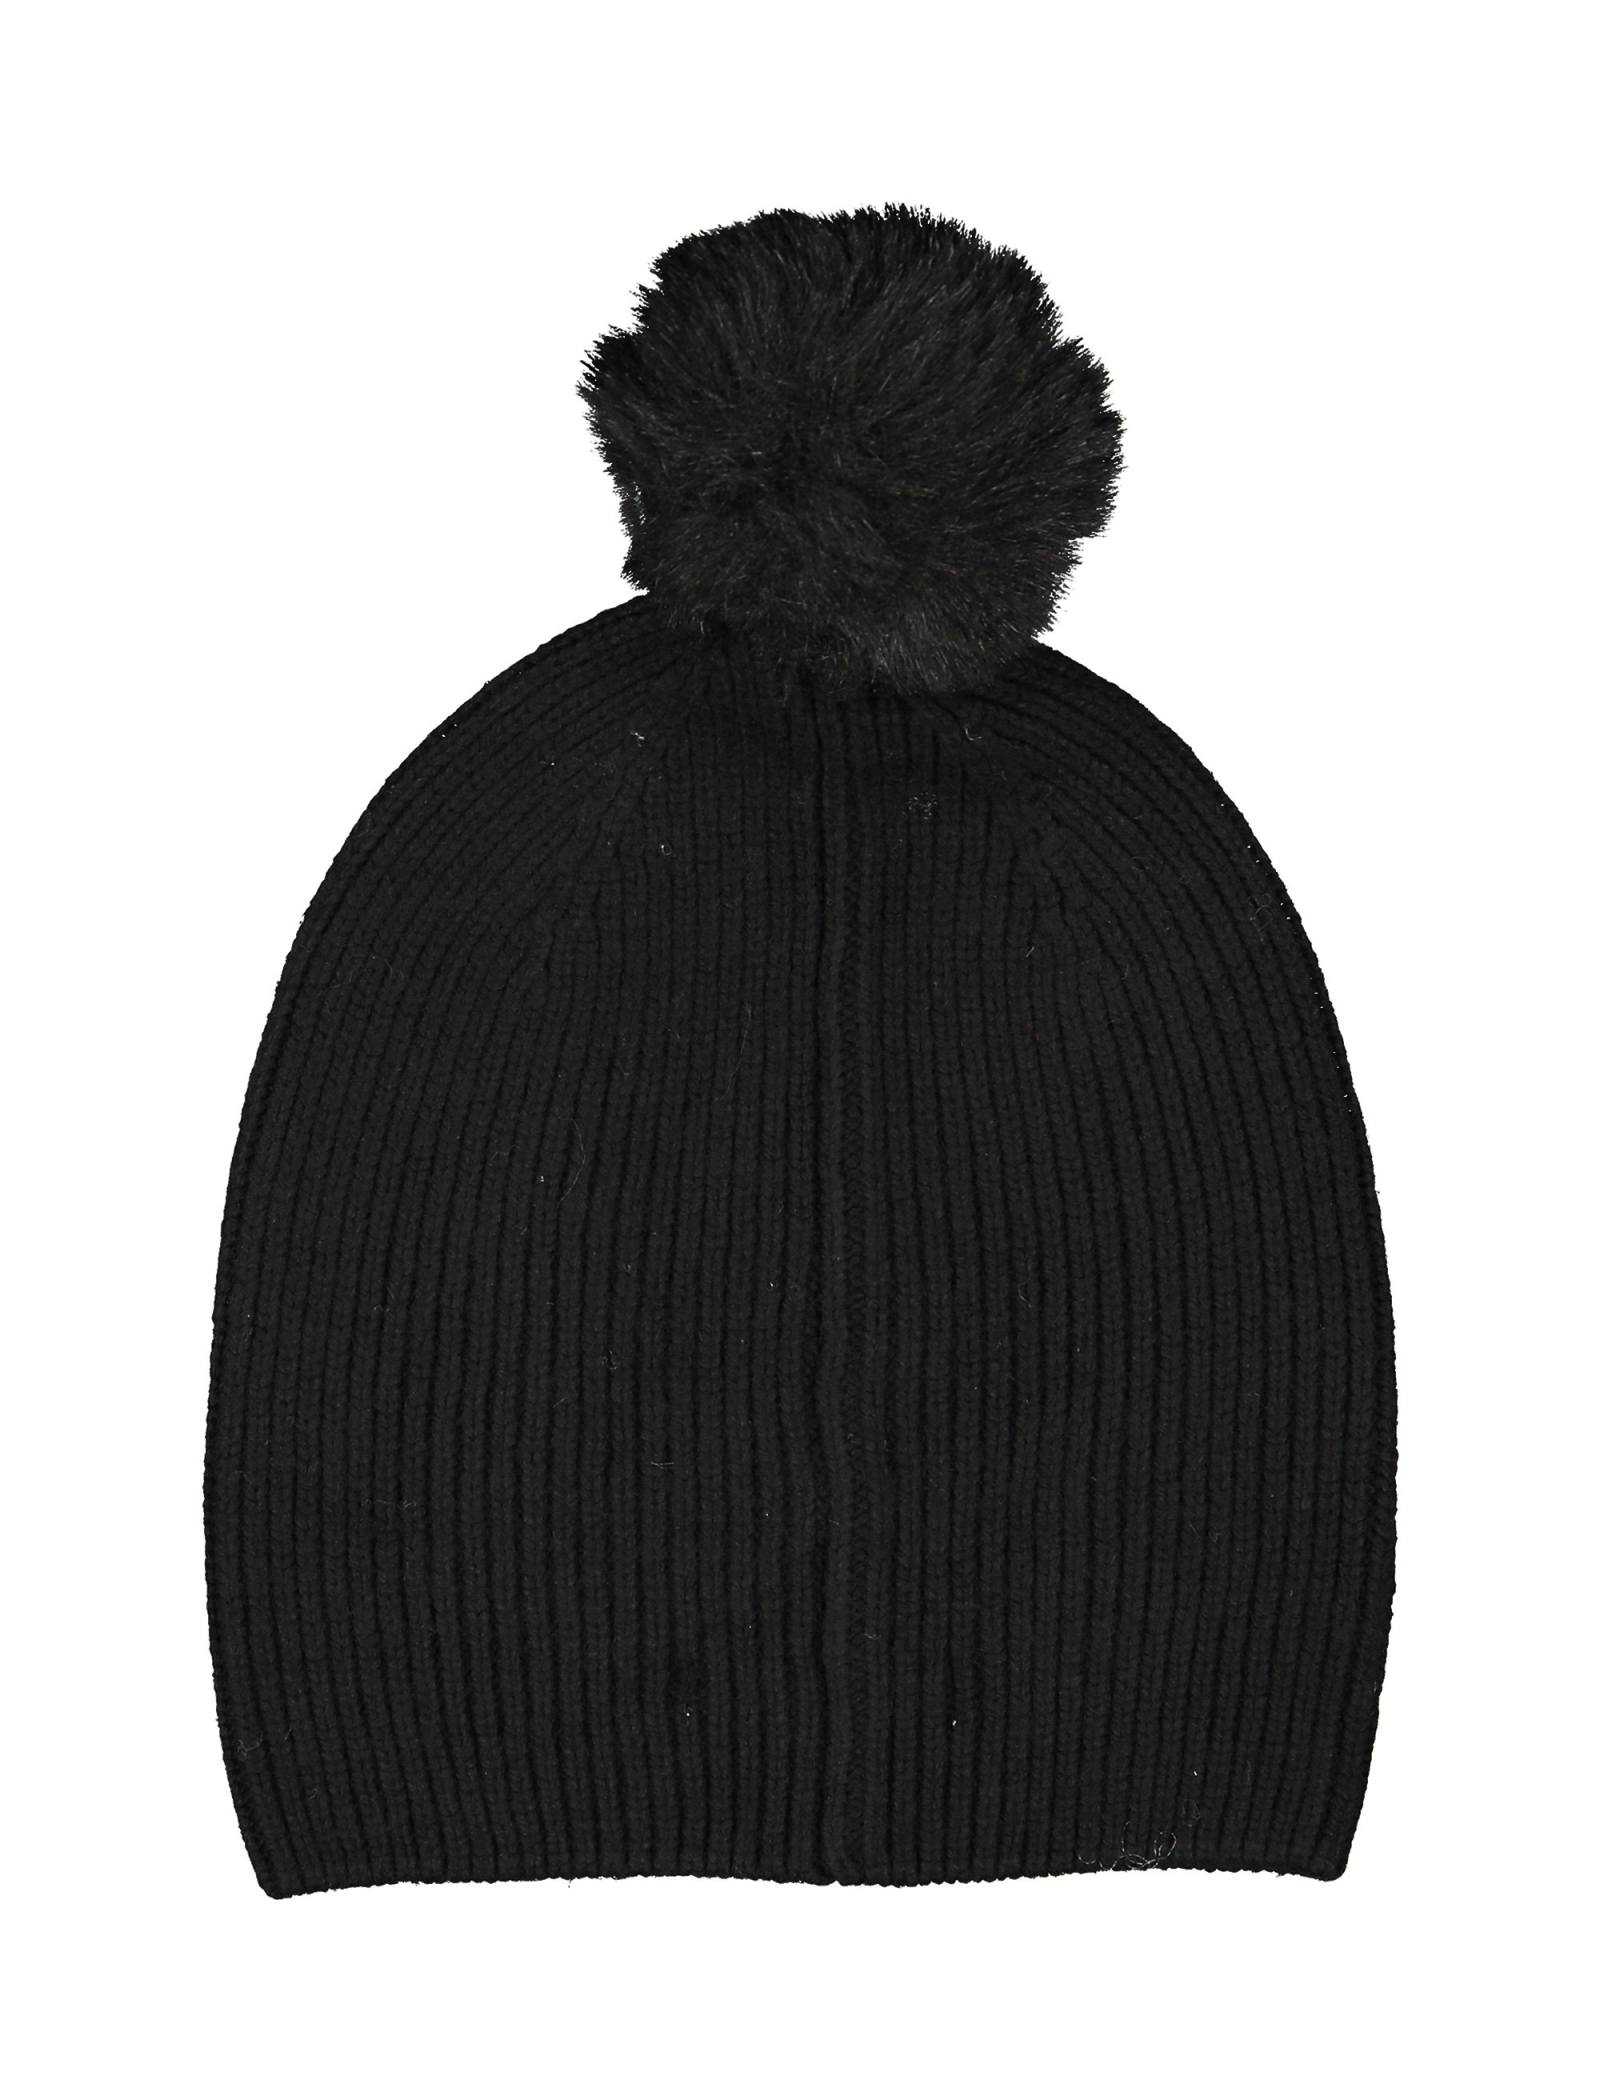 کلاه بافتنی زنانه - پی سز - مشکي   - 2